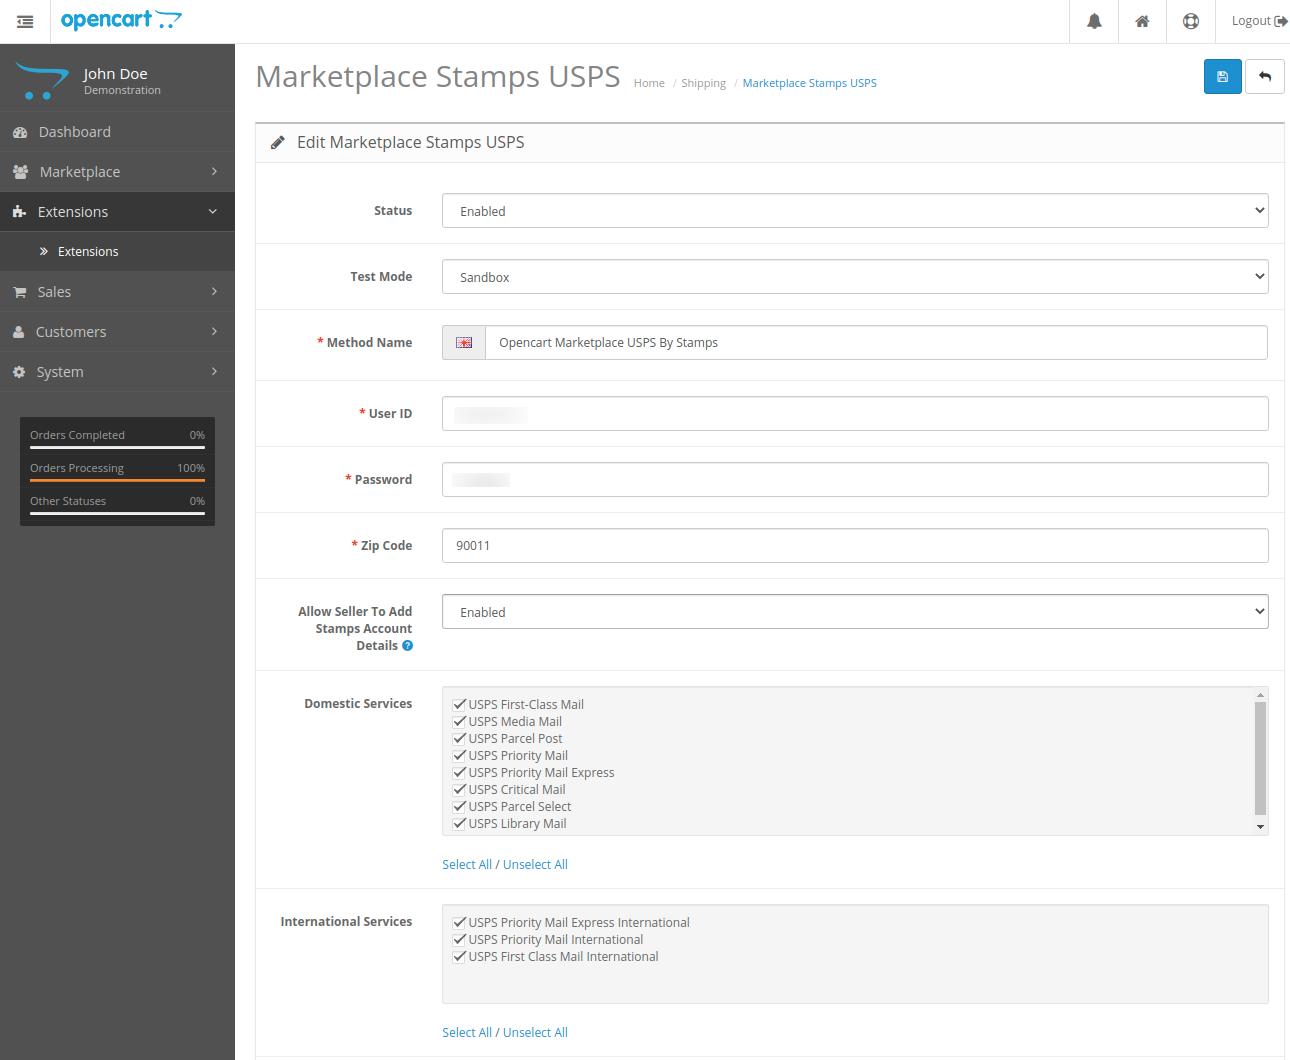 webkul-opencart-marketplace-usps-shipping-admin-configurations-part-1-1